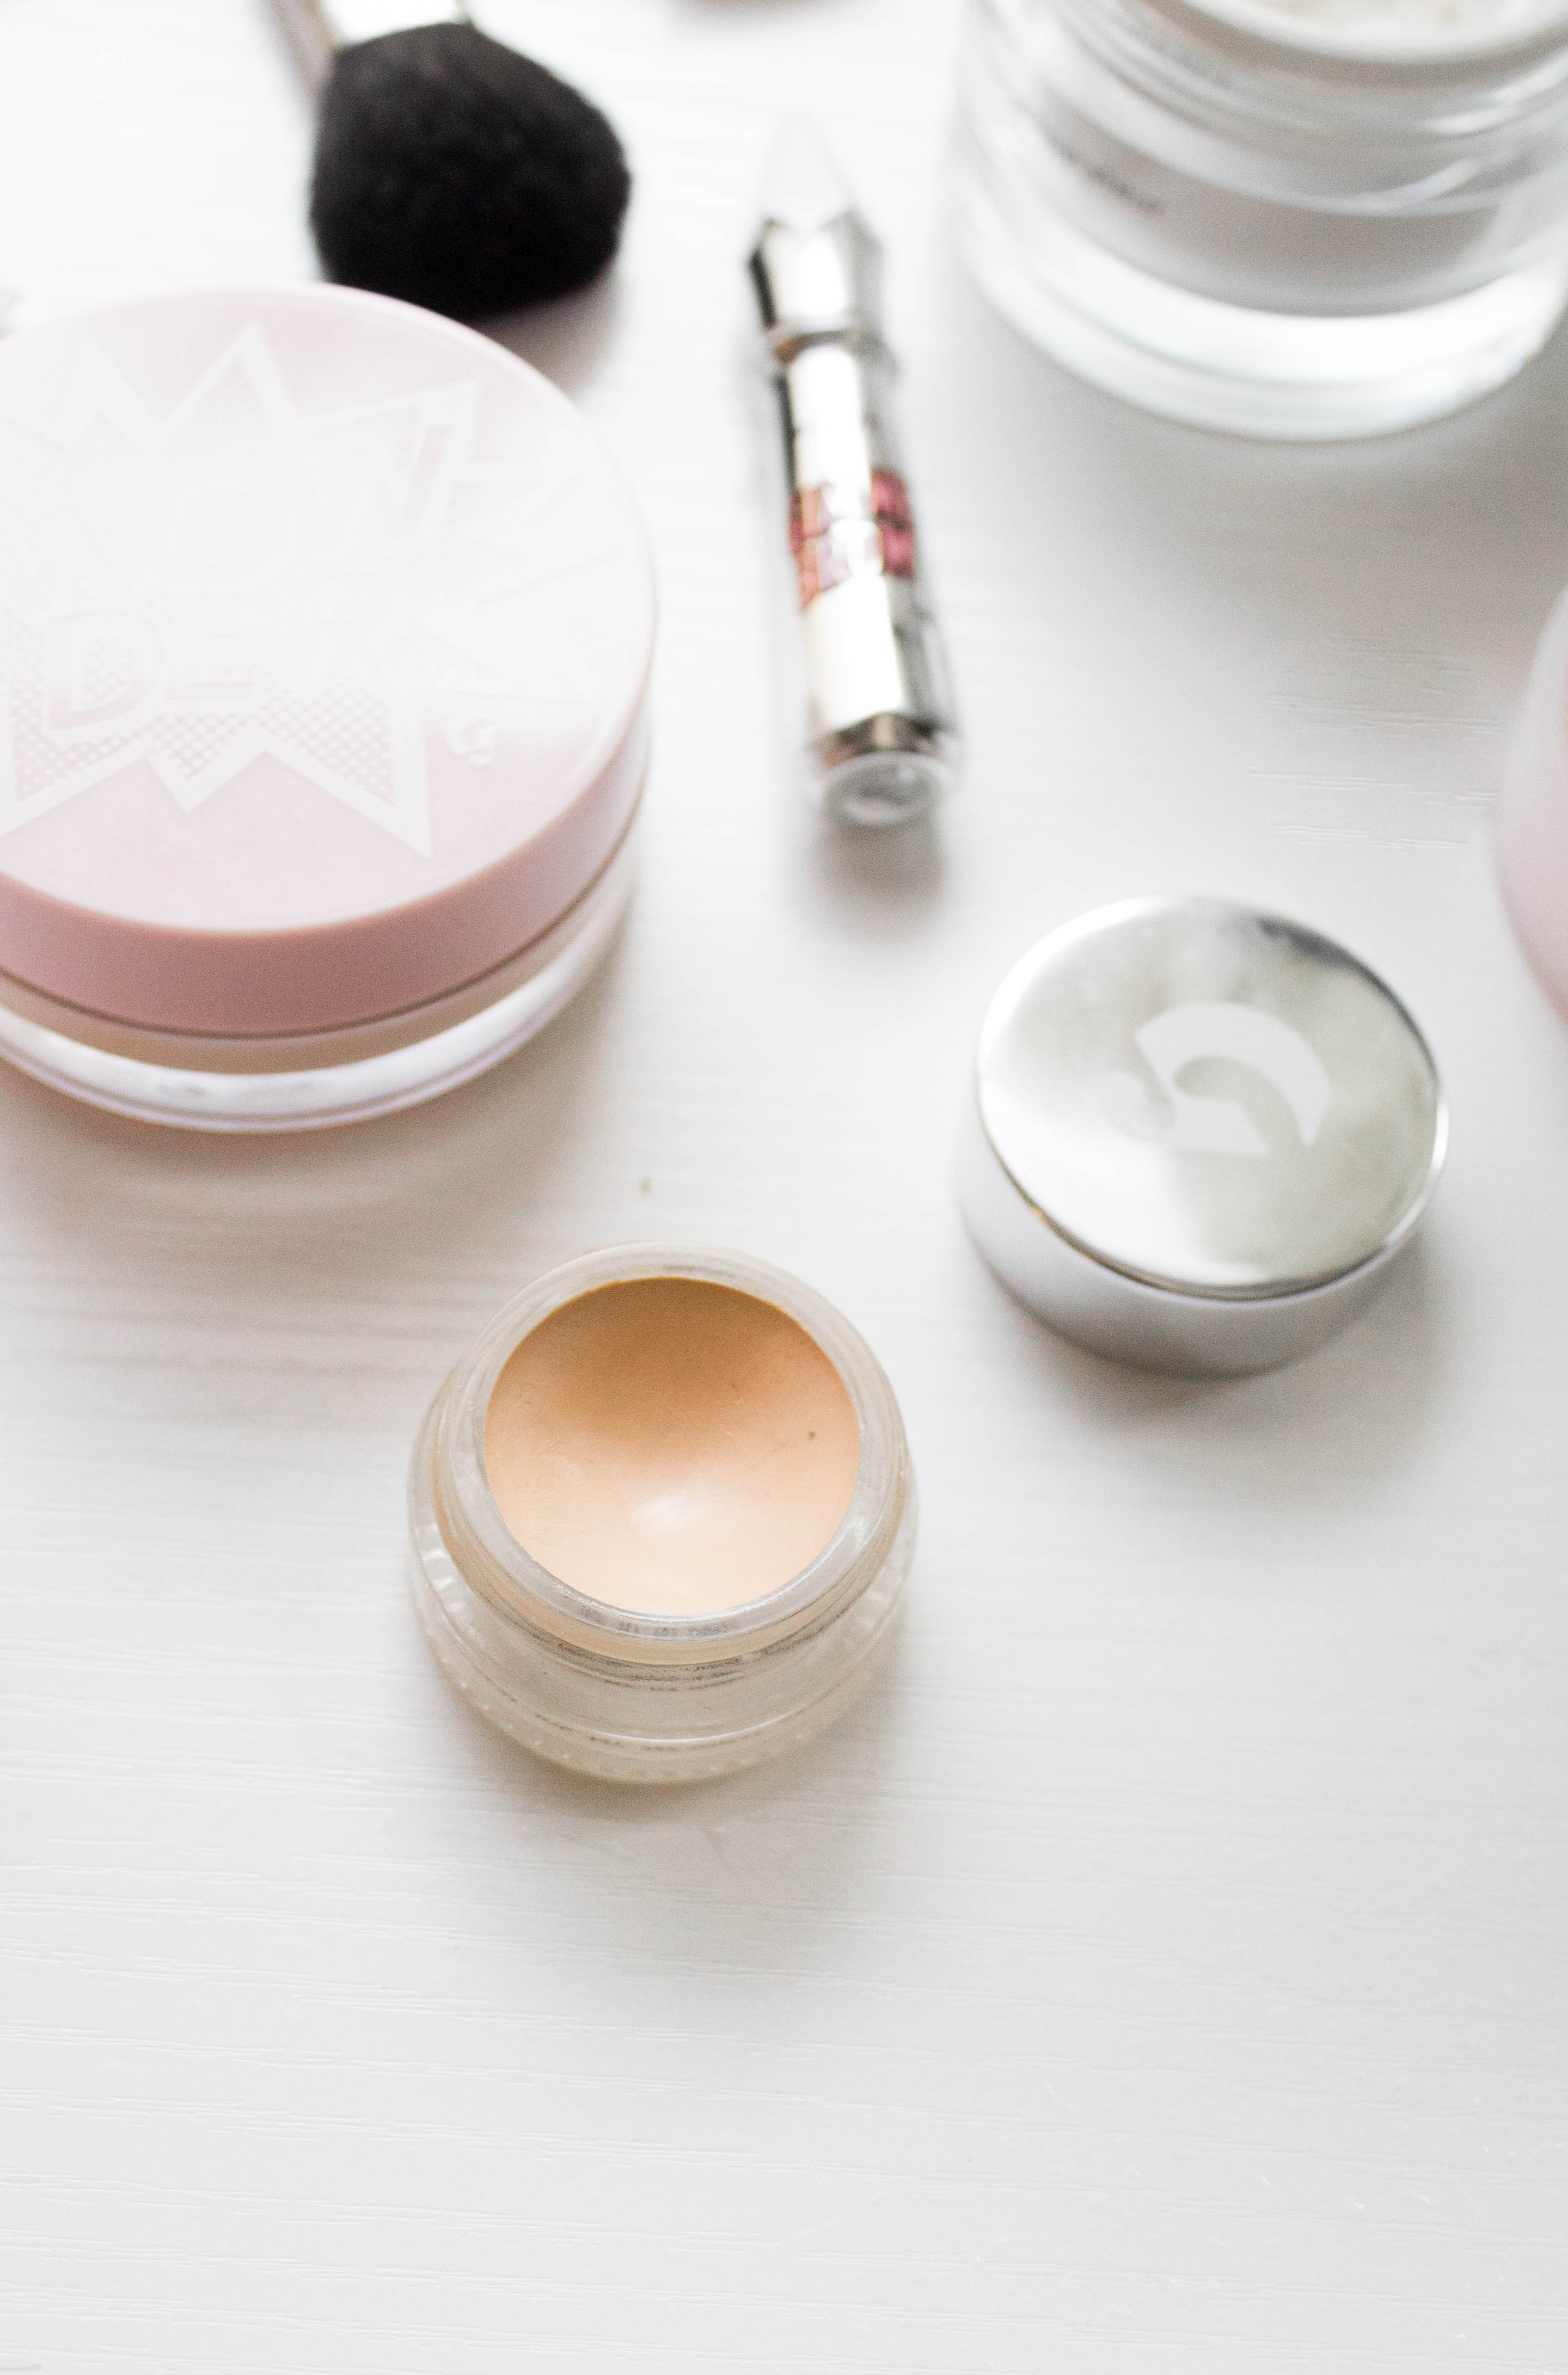 fall makeup, simple makeup, glossier makeup, glossier moisturizer